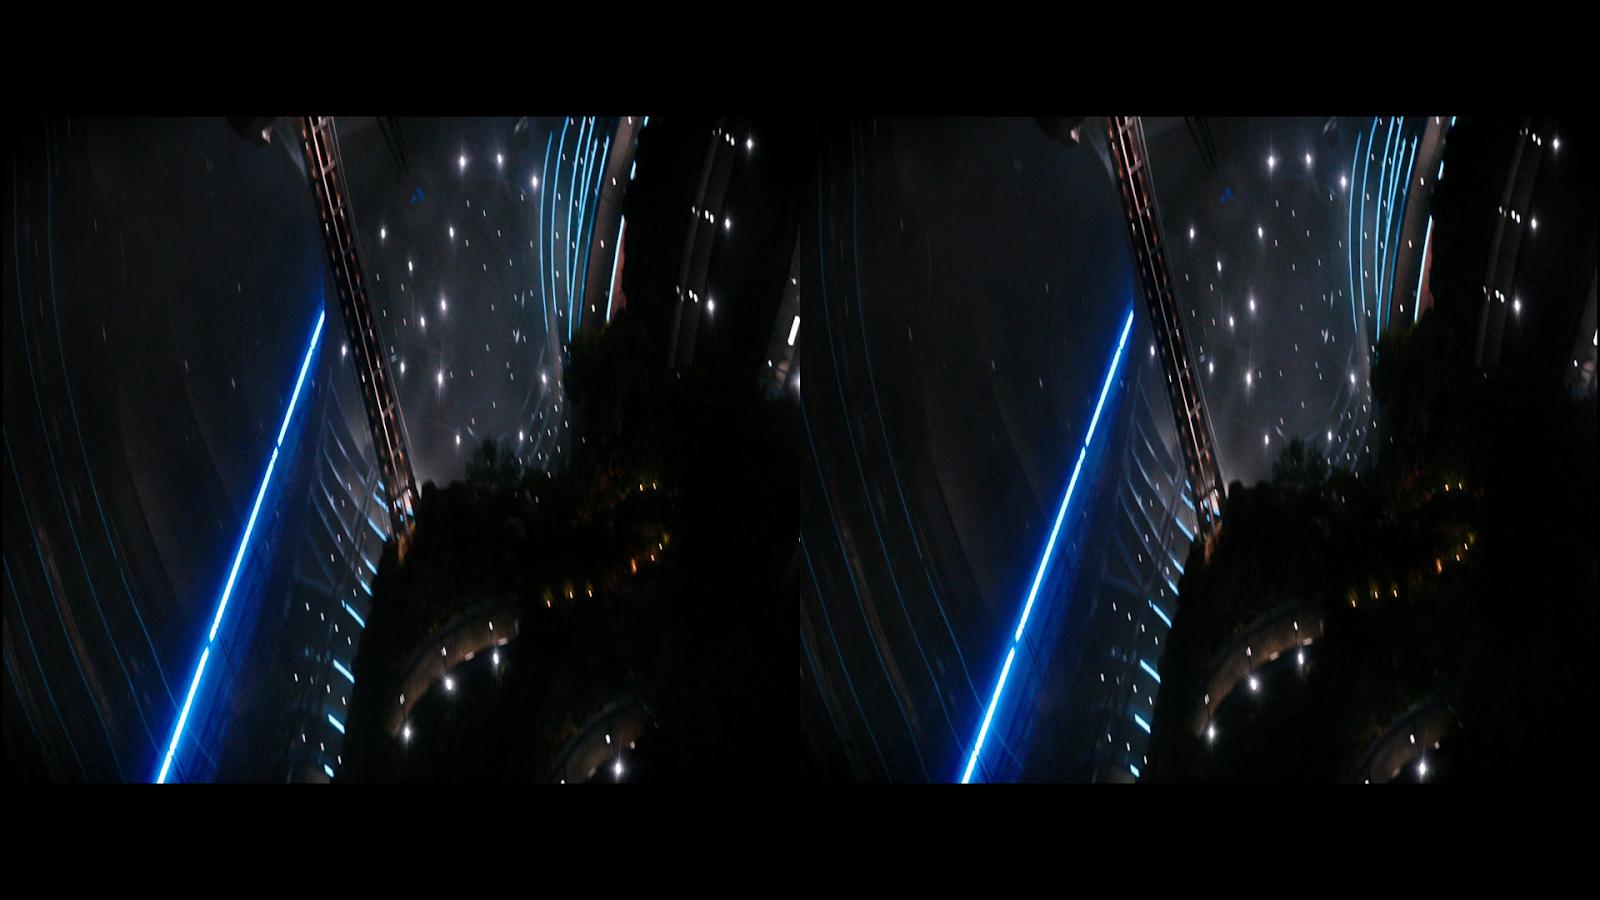 Rascacielos: Rescate en las Alturas (2018) 3D SBS Full 1080p Latino-Ingles captura 3